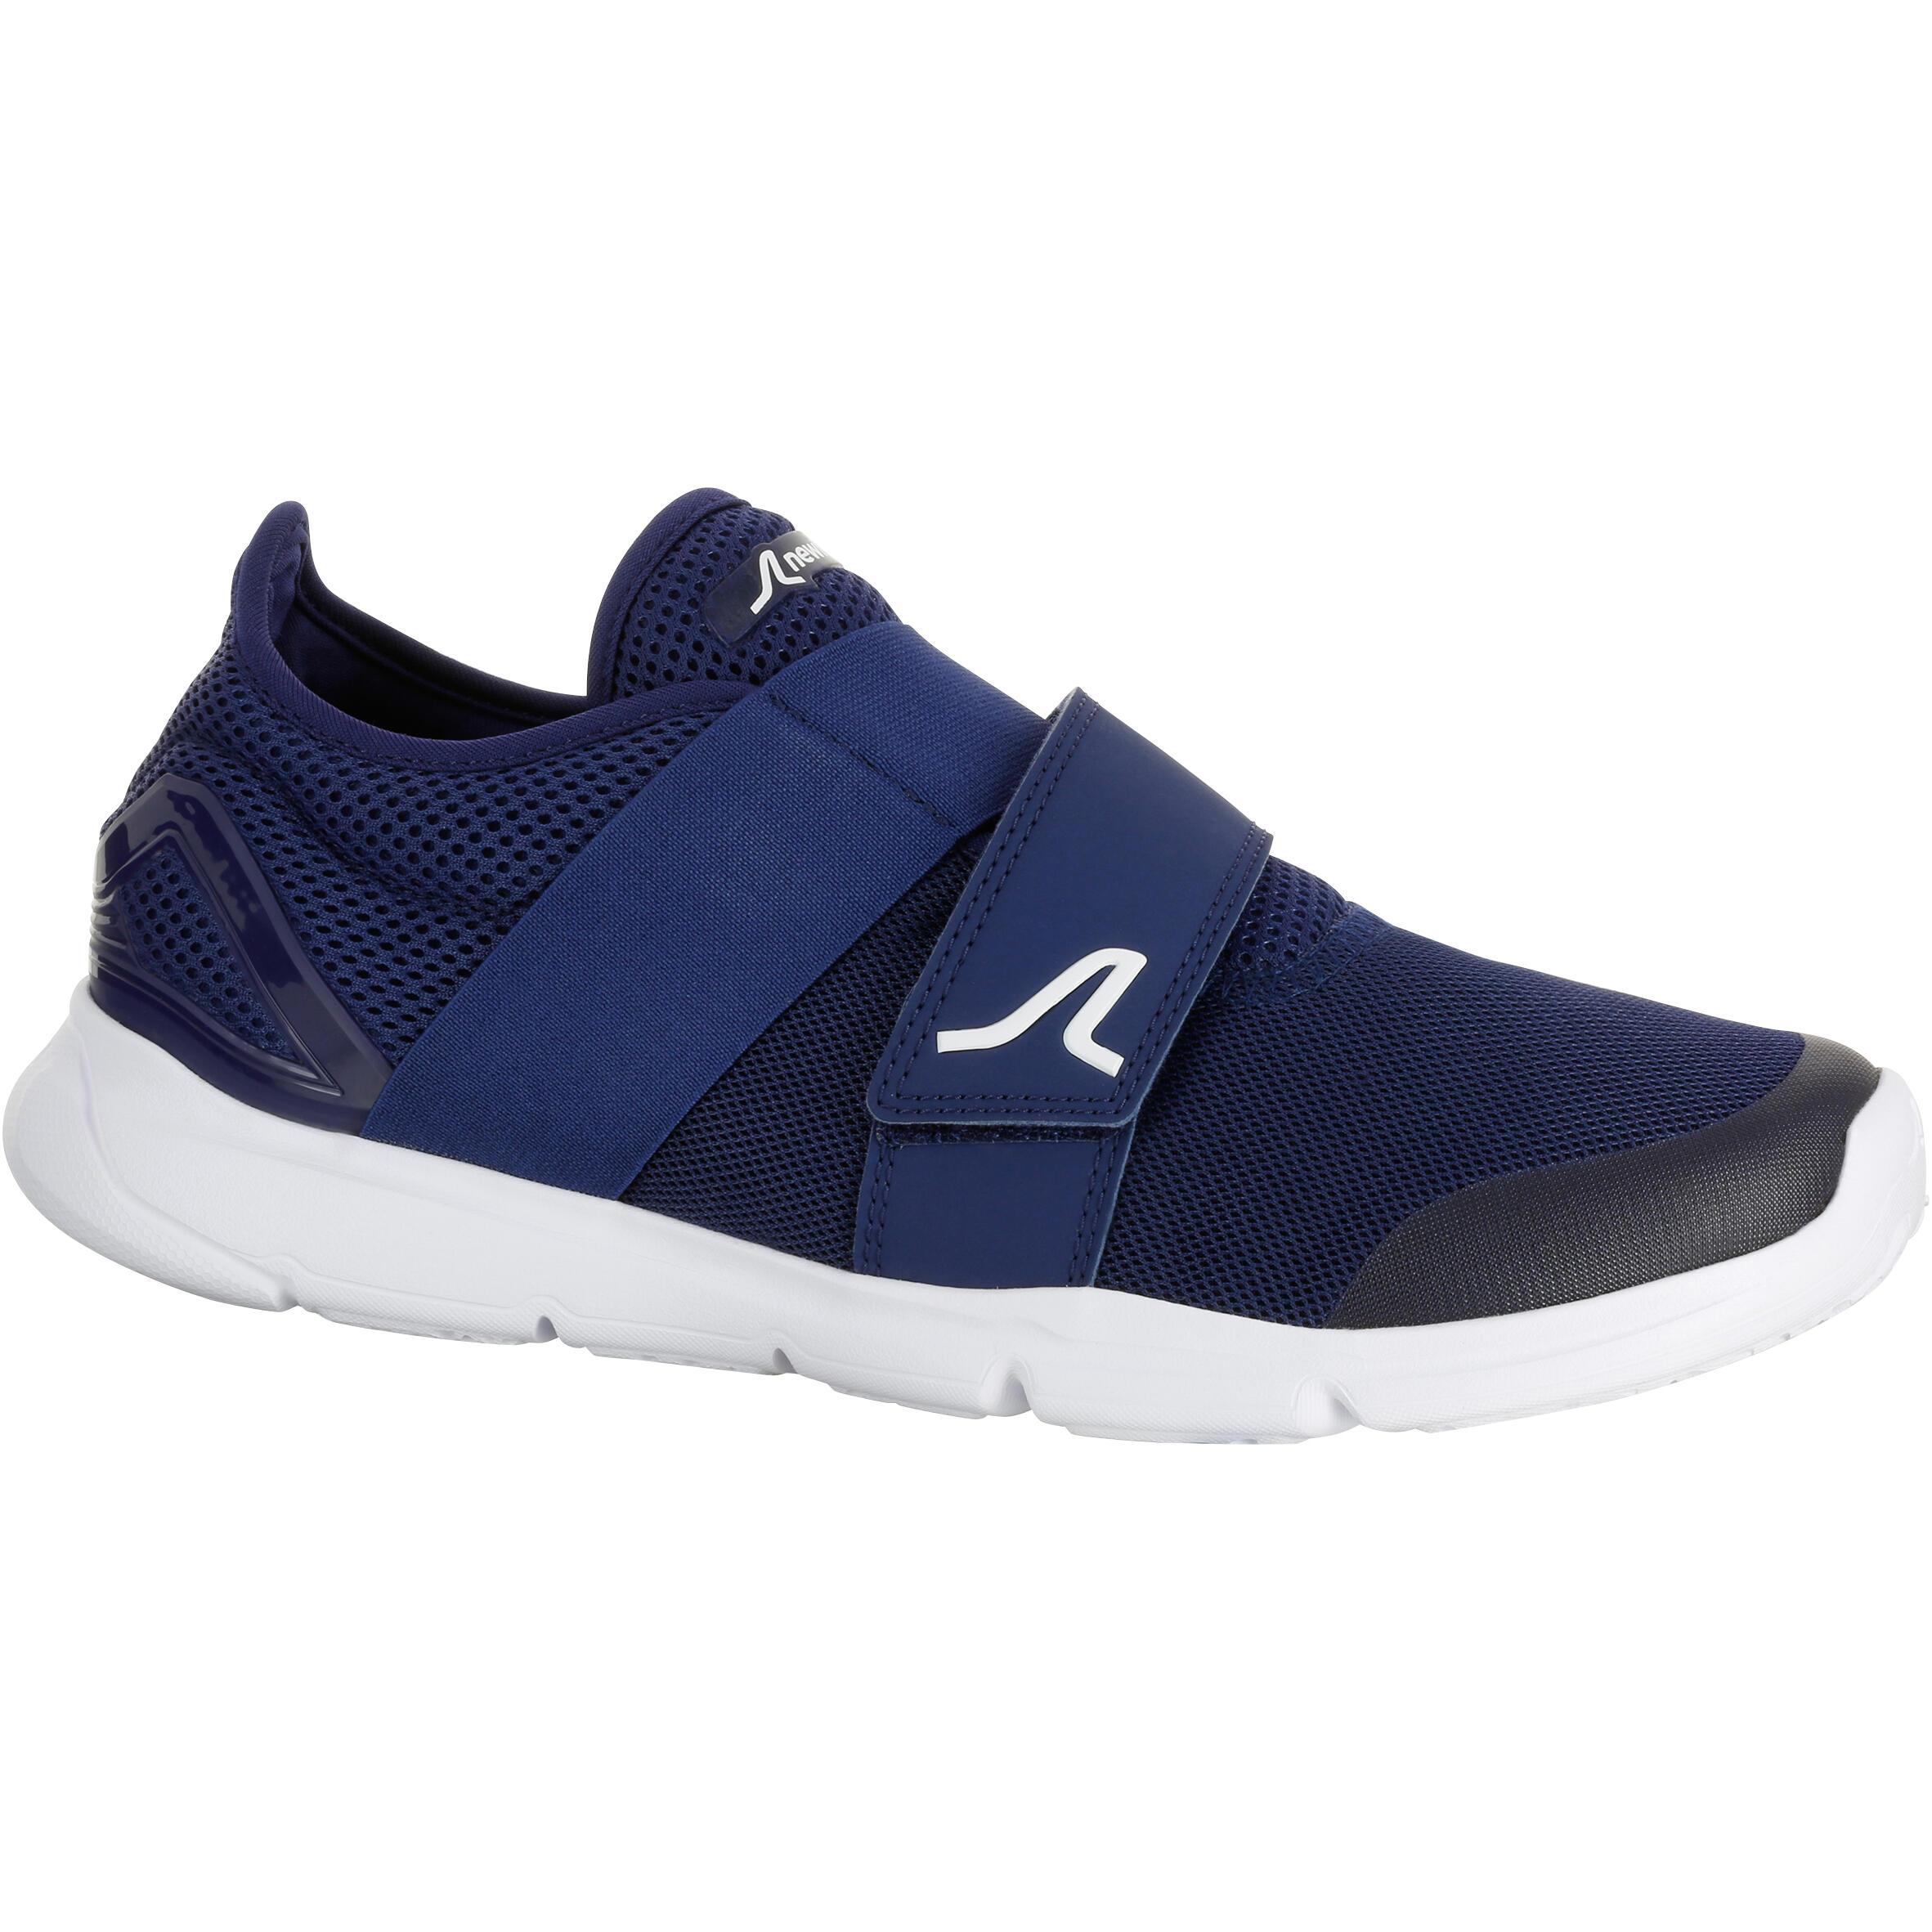 Shoes for Men Buy Online - Decathlon